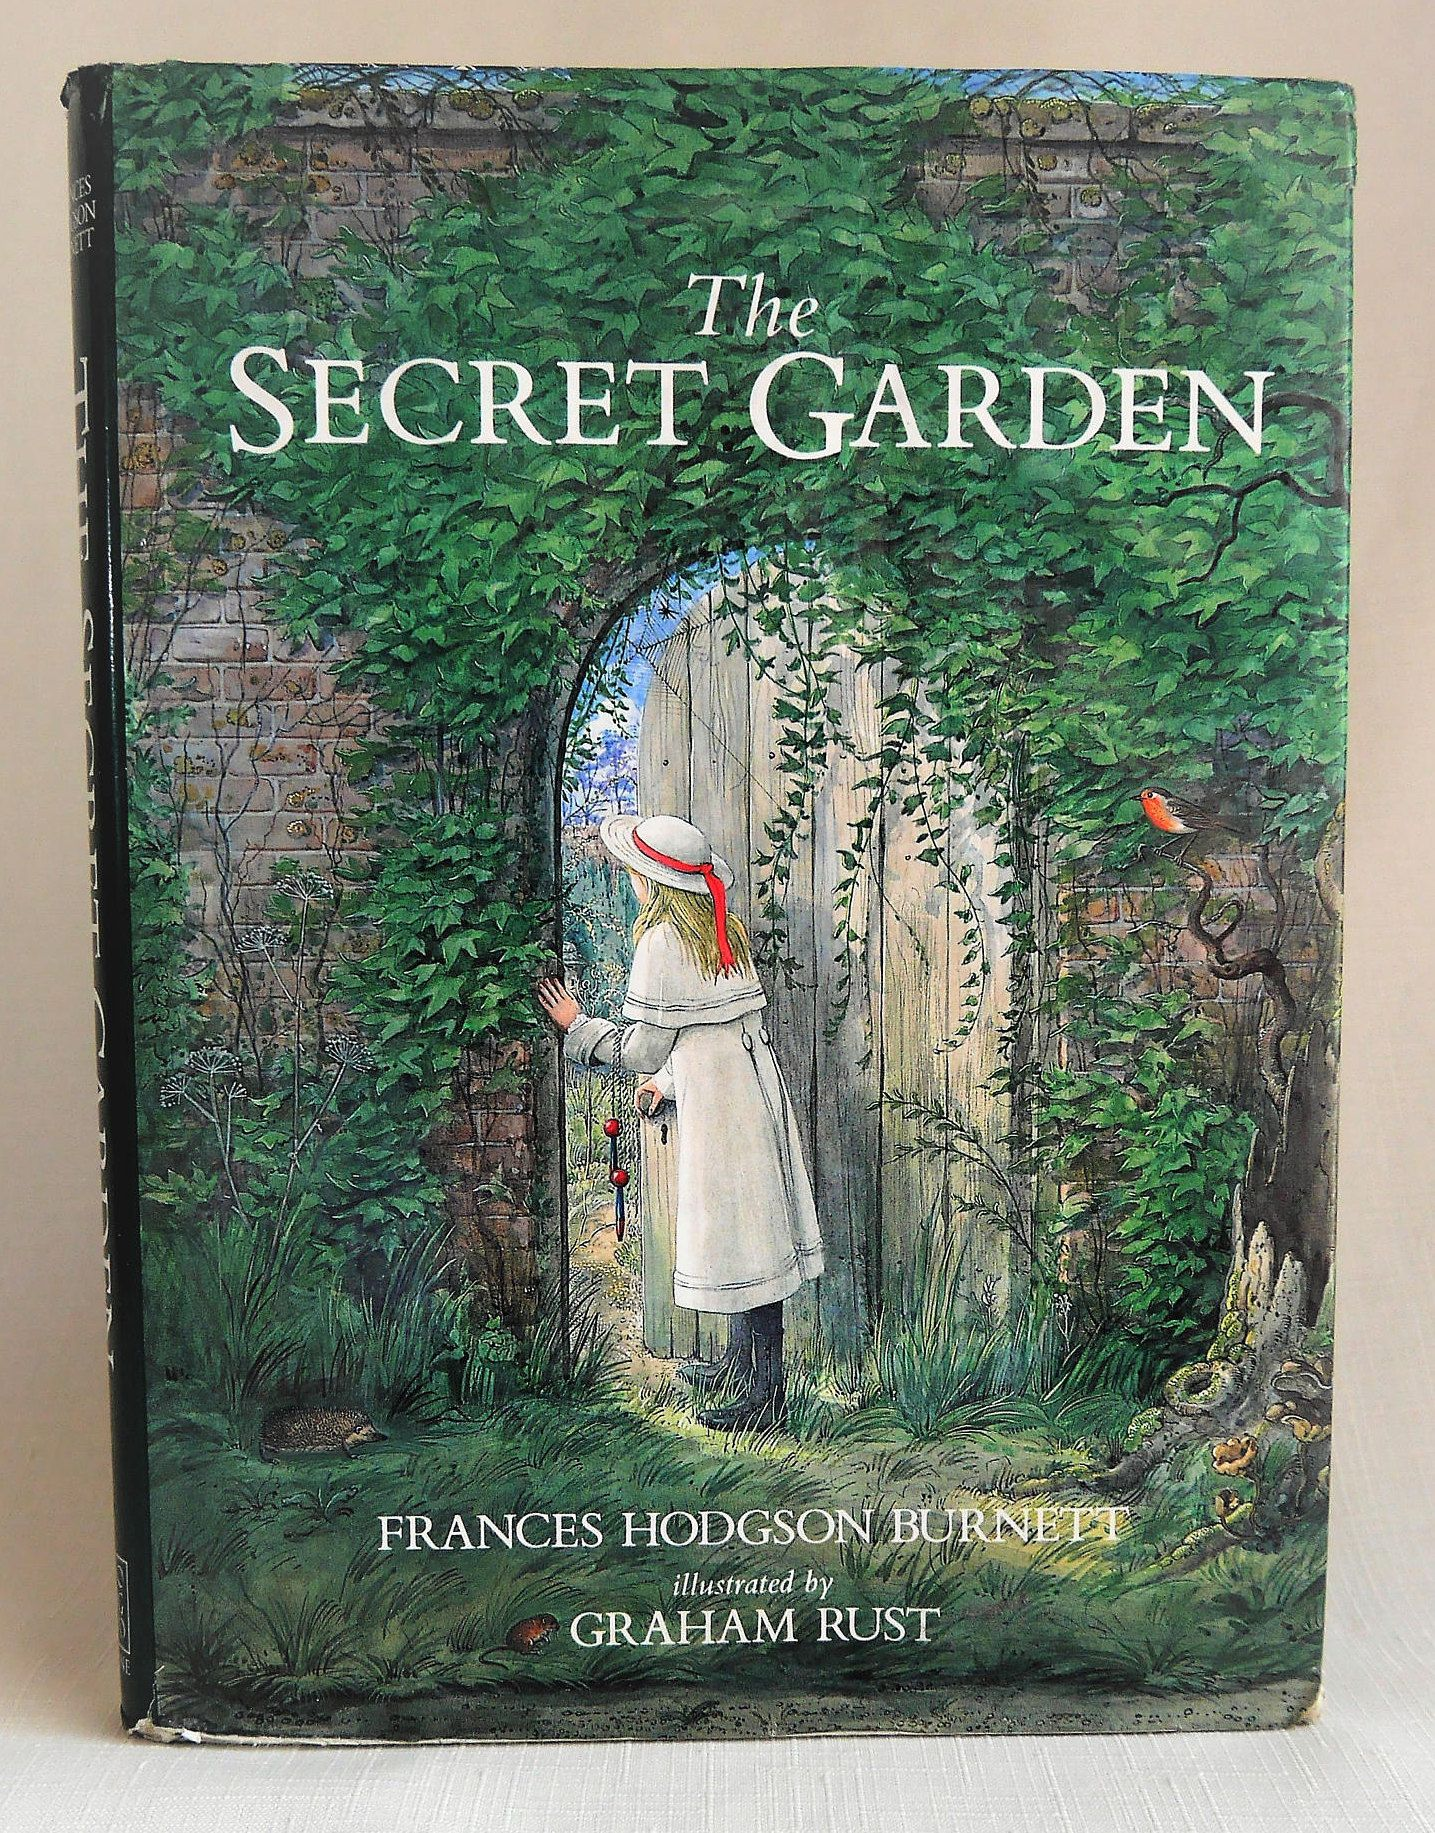 The Secret Garden Hardcover Book with Jacket, Children's